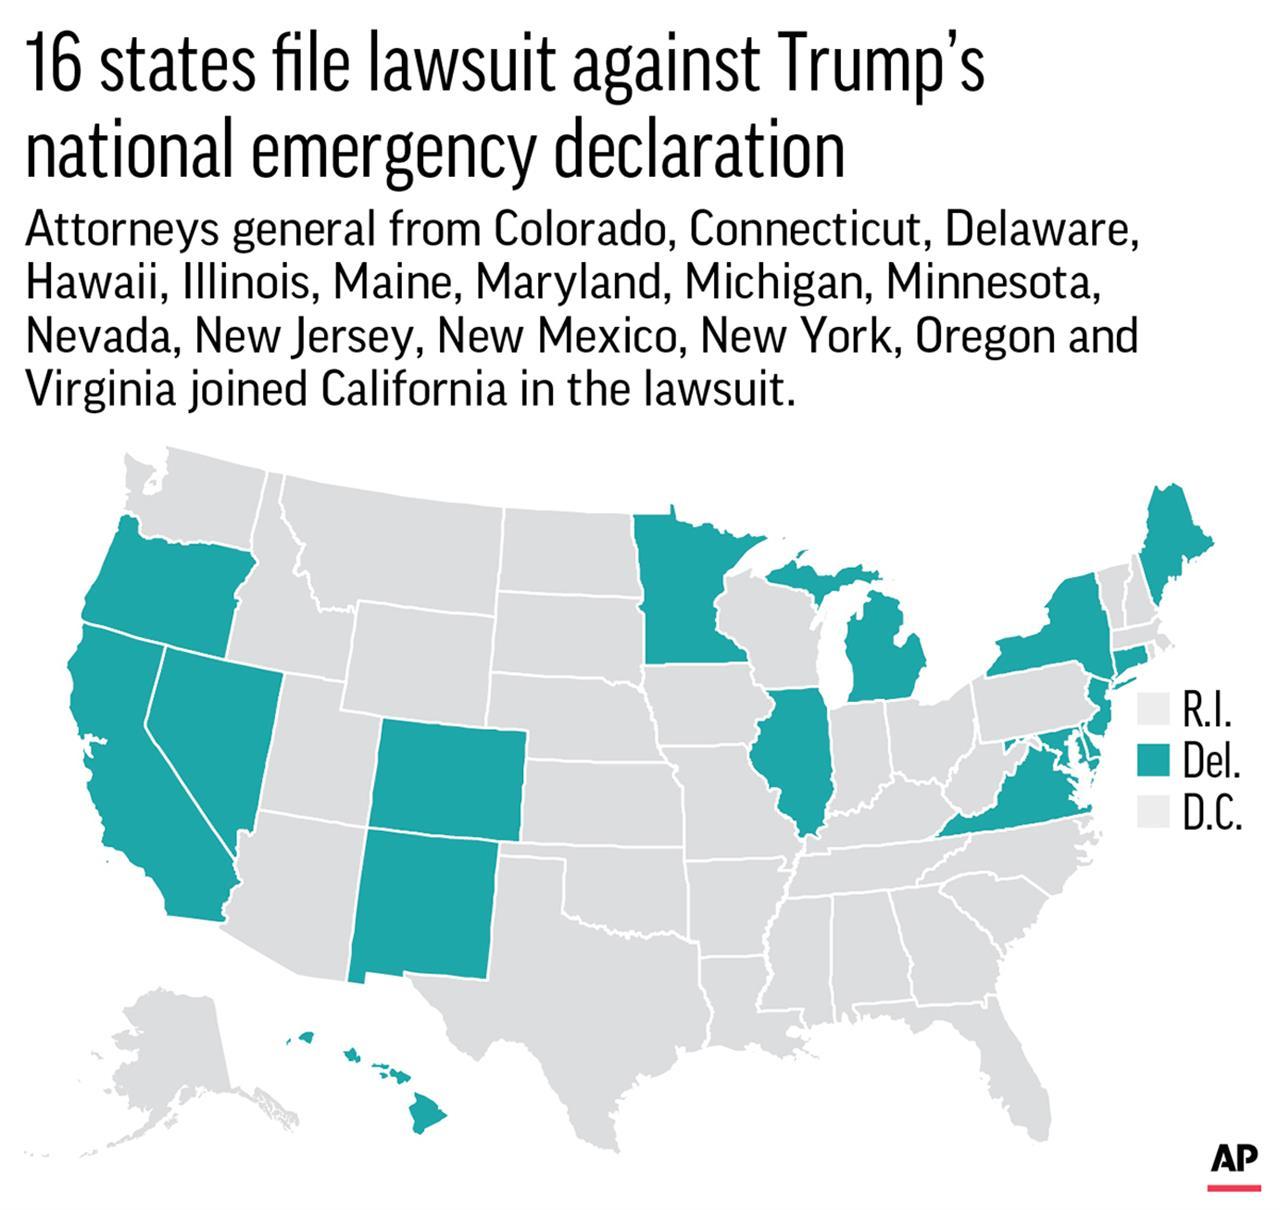 PC: Associated Press